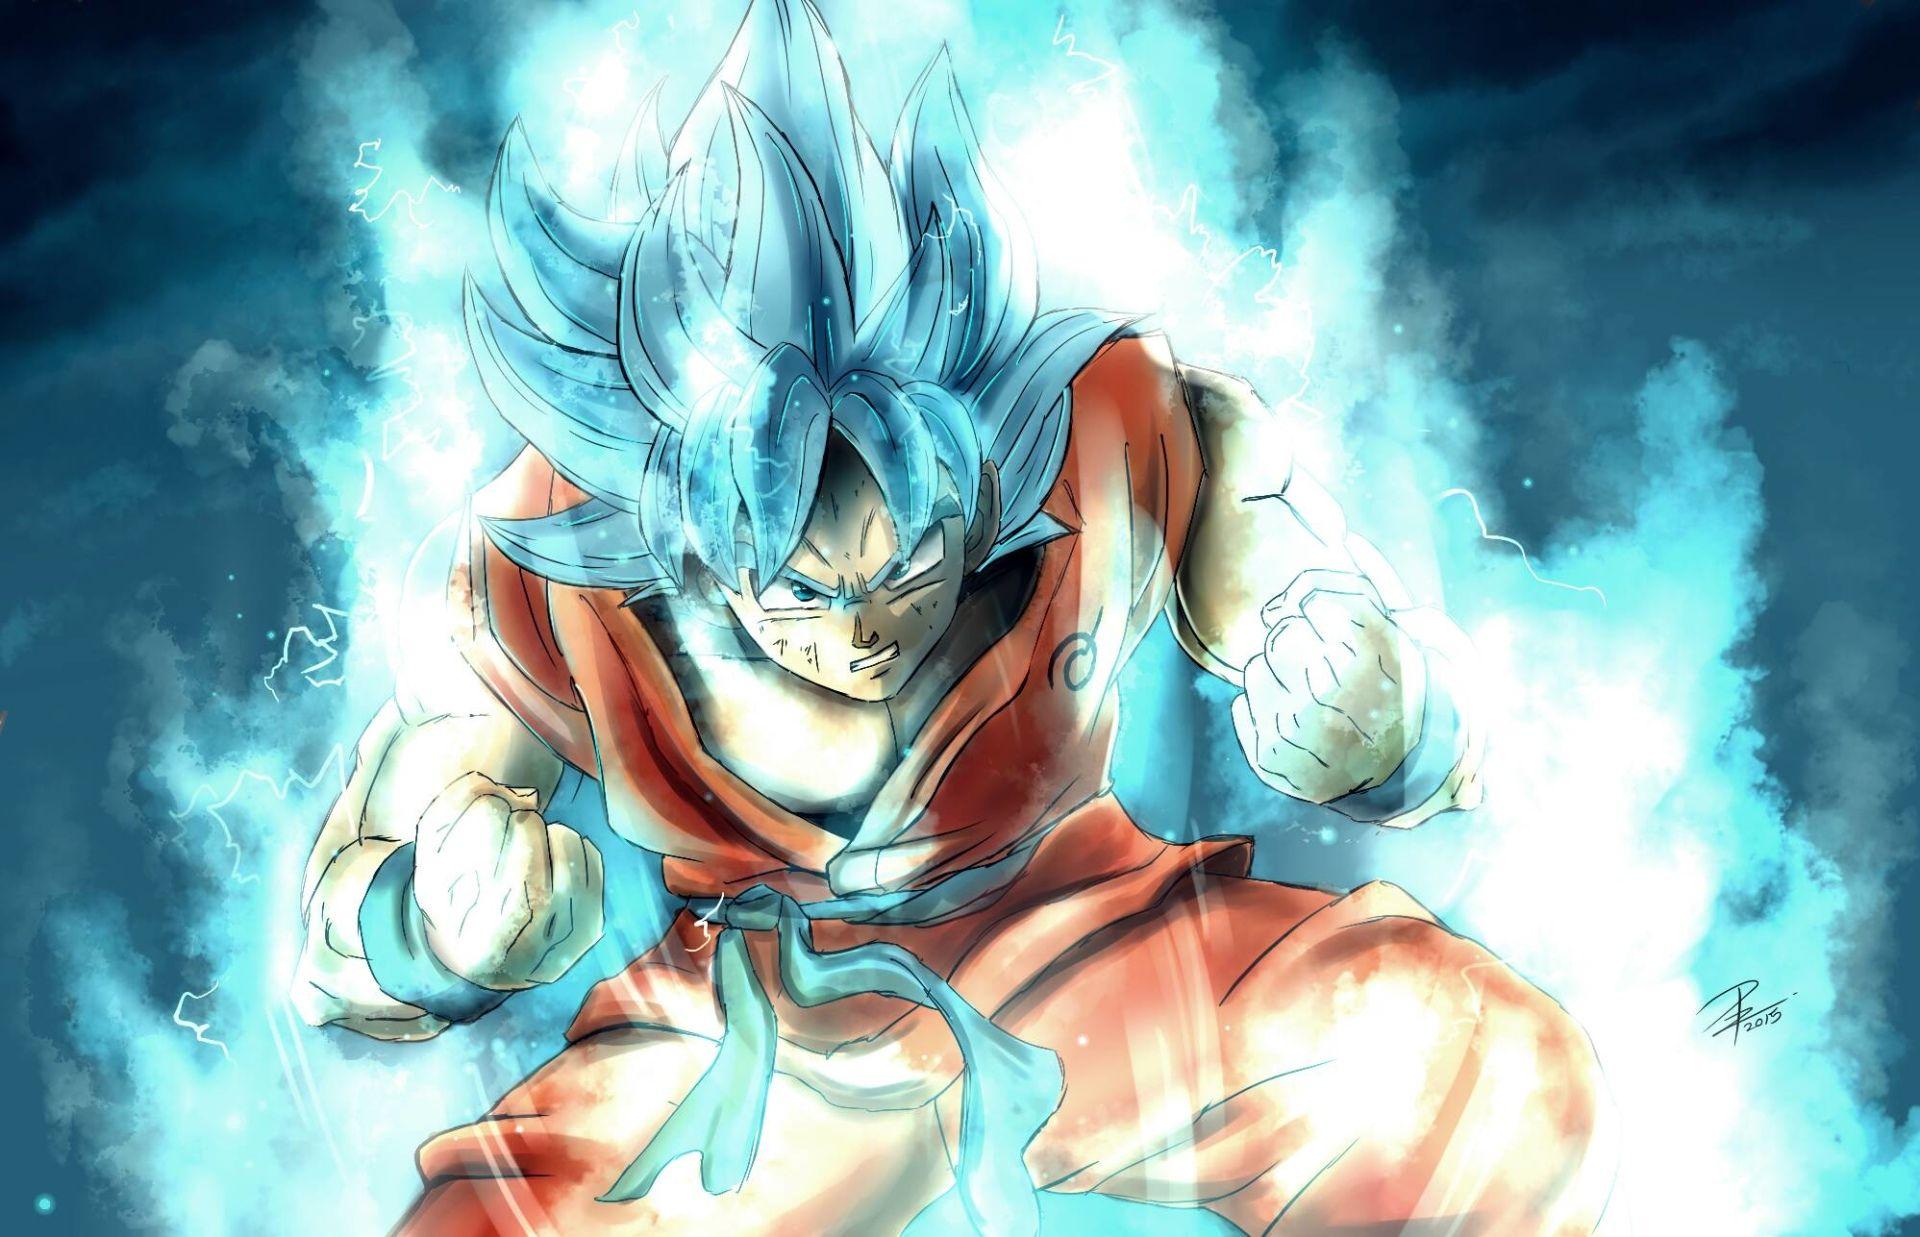 Goku Ssj Dios Para Fondo De Pantalla: Anime Dragon Ball Super Goku Super Saiyan Blue Fondo De